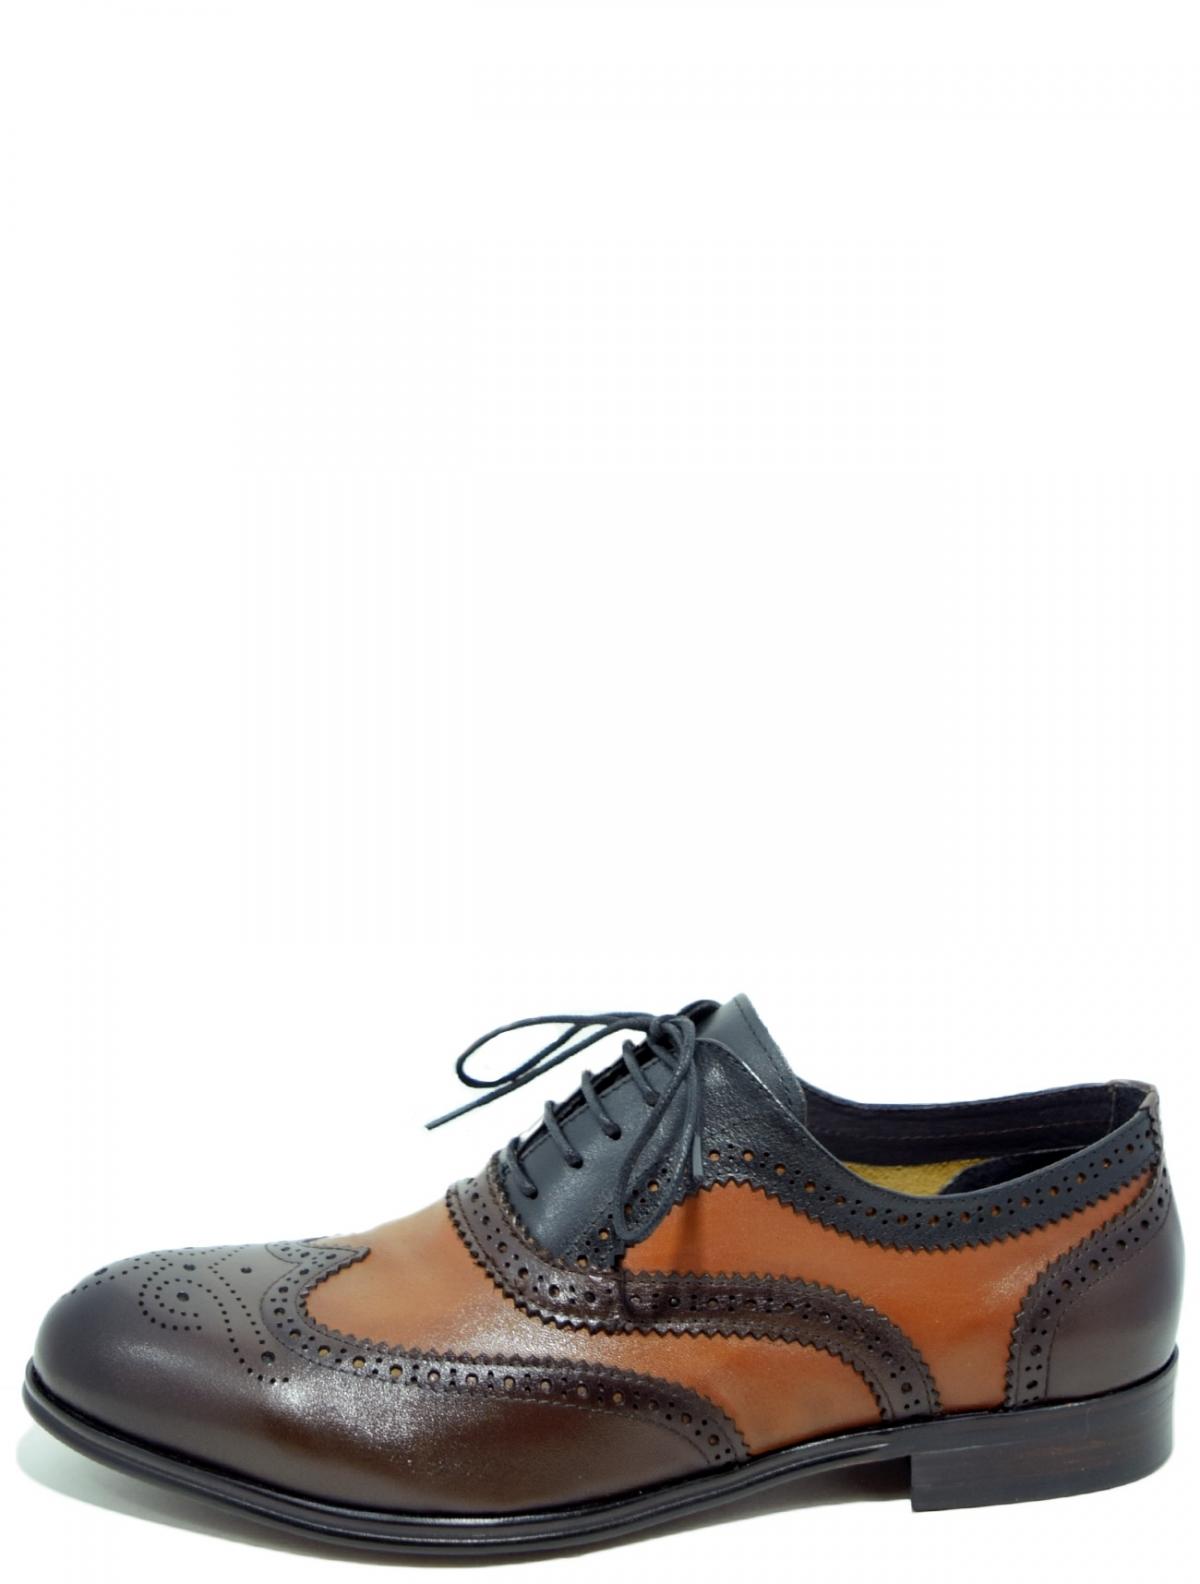 Roscote B206-B10-SG5-T3213 мужские туфли